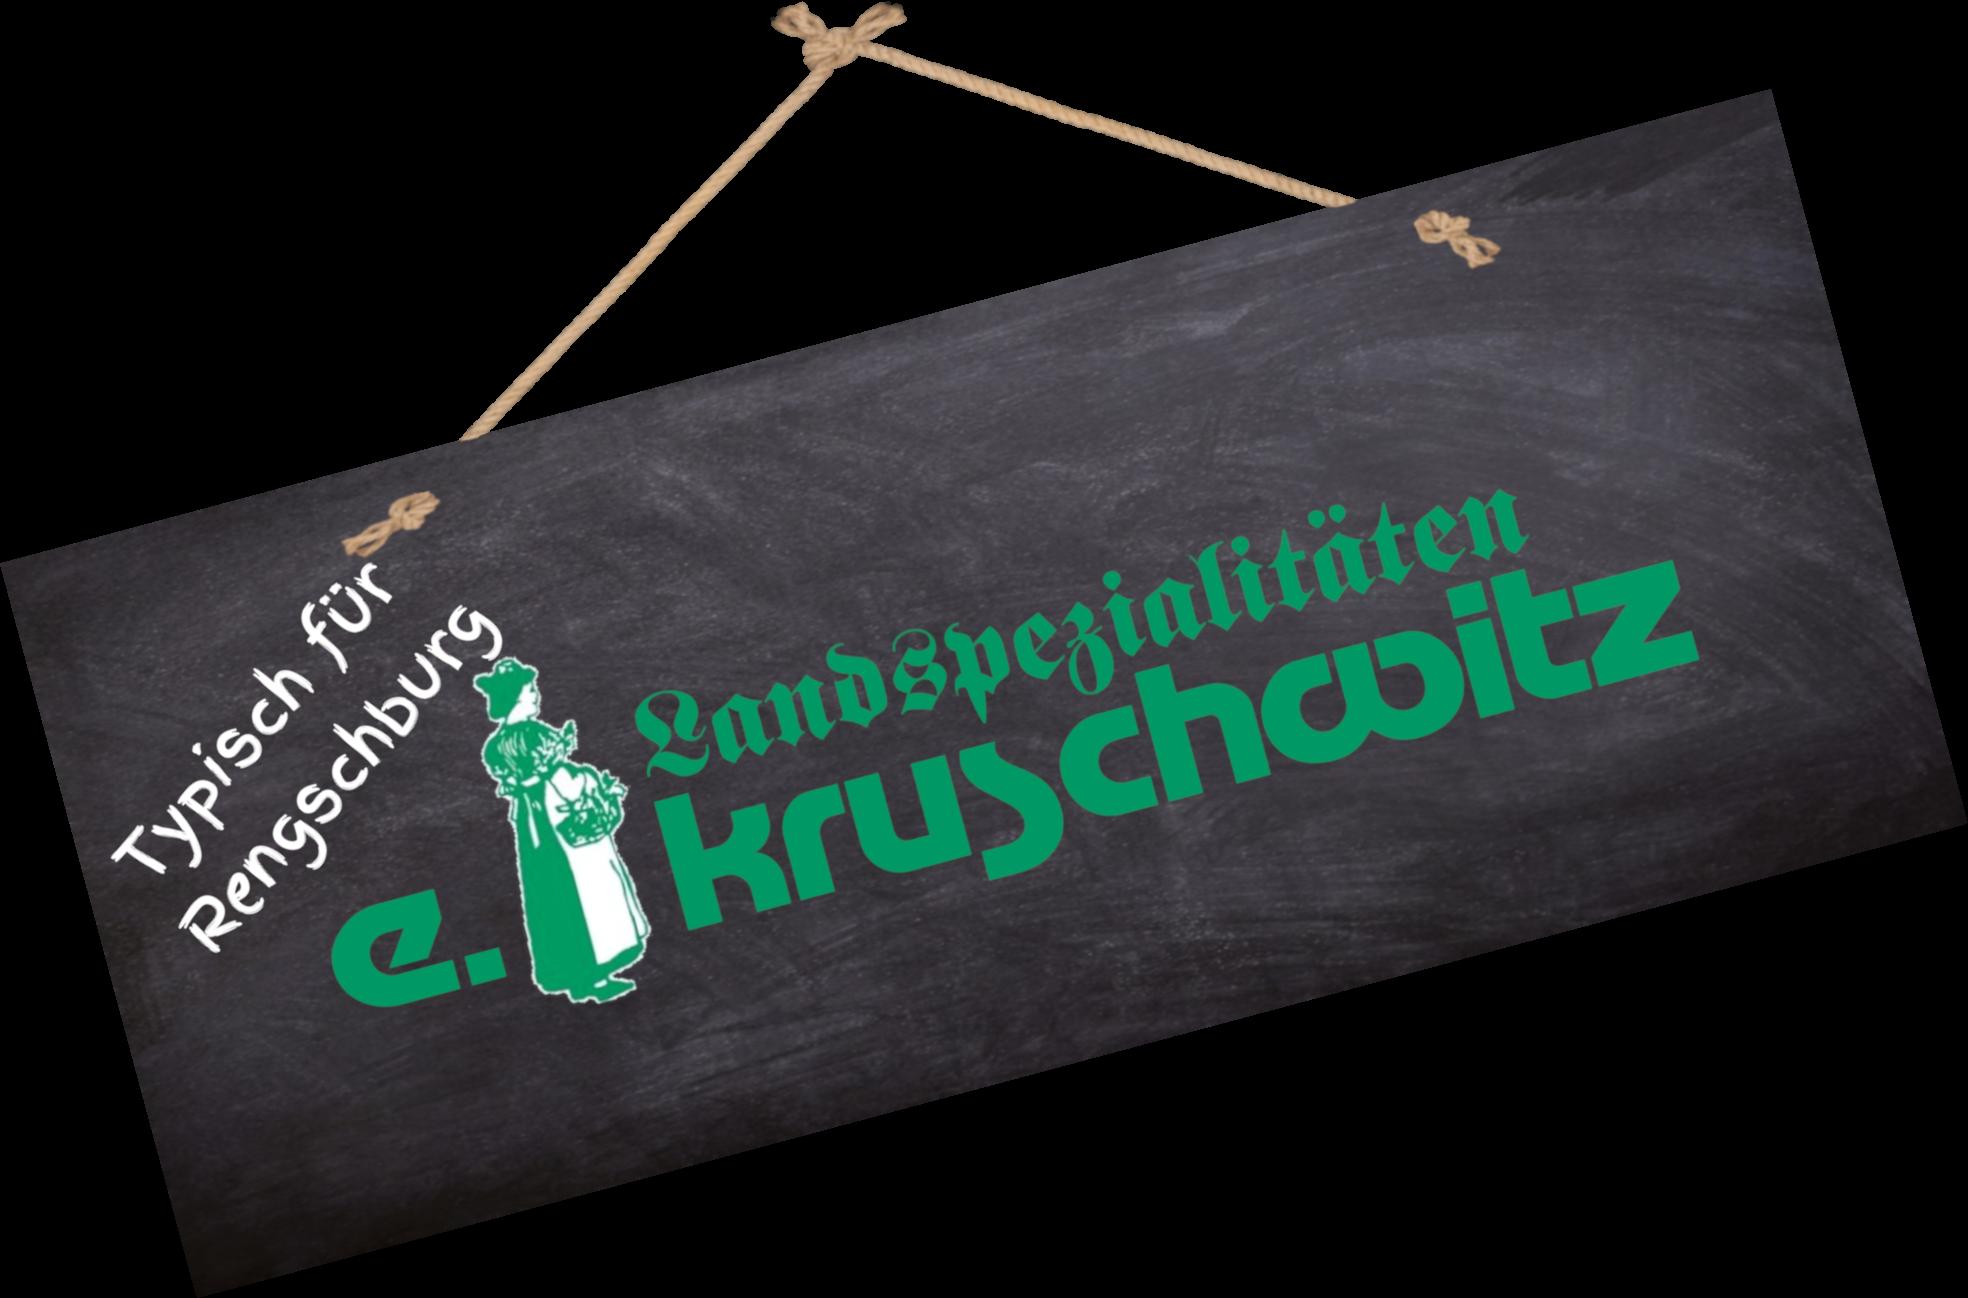 Landspezialitäten e. Kruschwitz e.K.